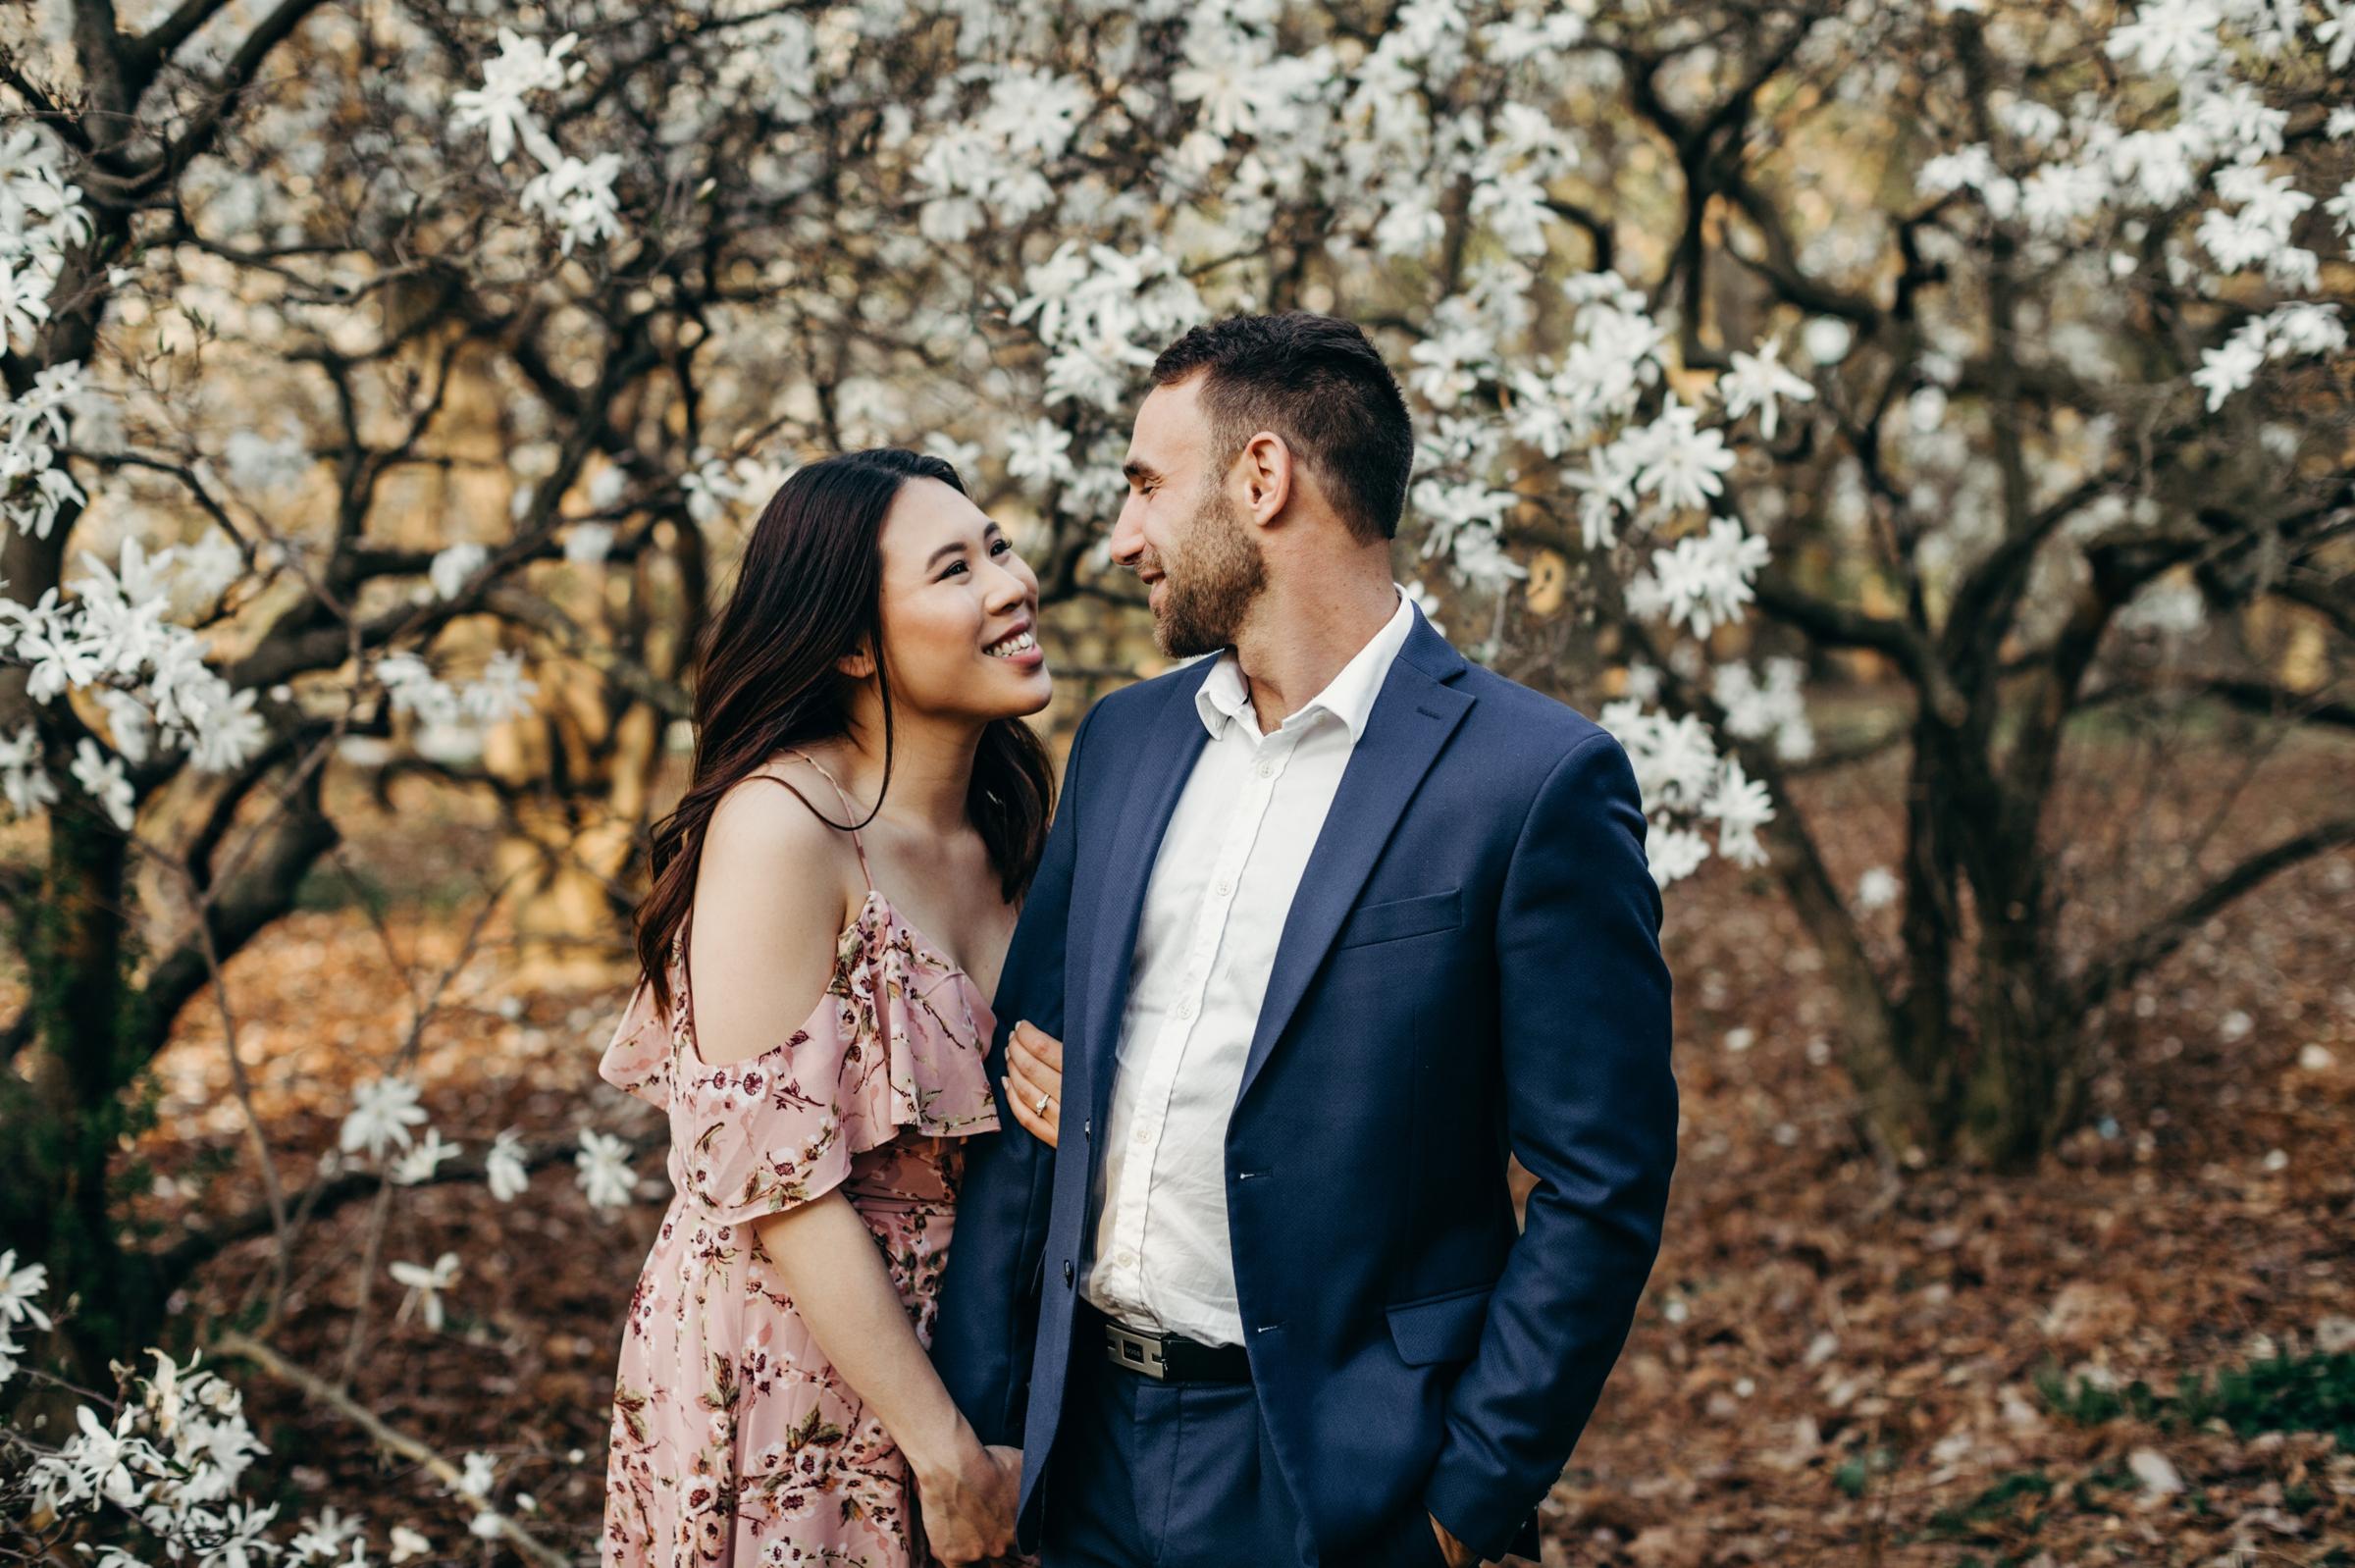 Ottawa Blossom Engagement Session - Tina and Matthew 7.jpg